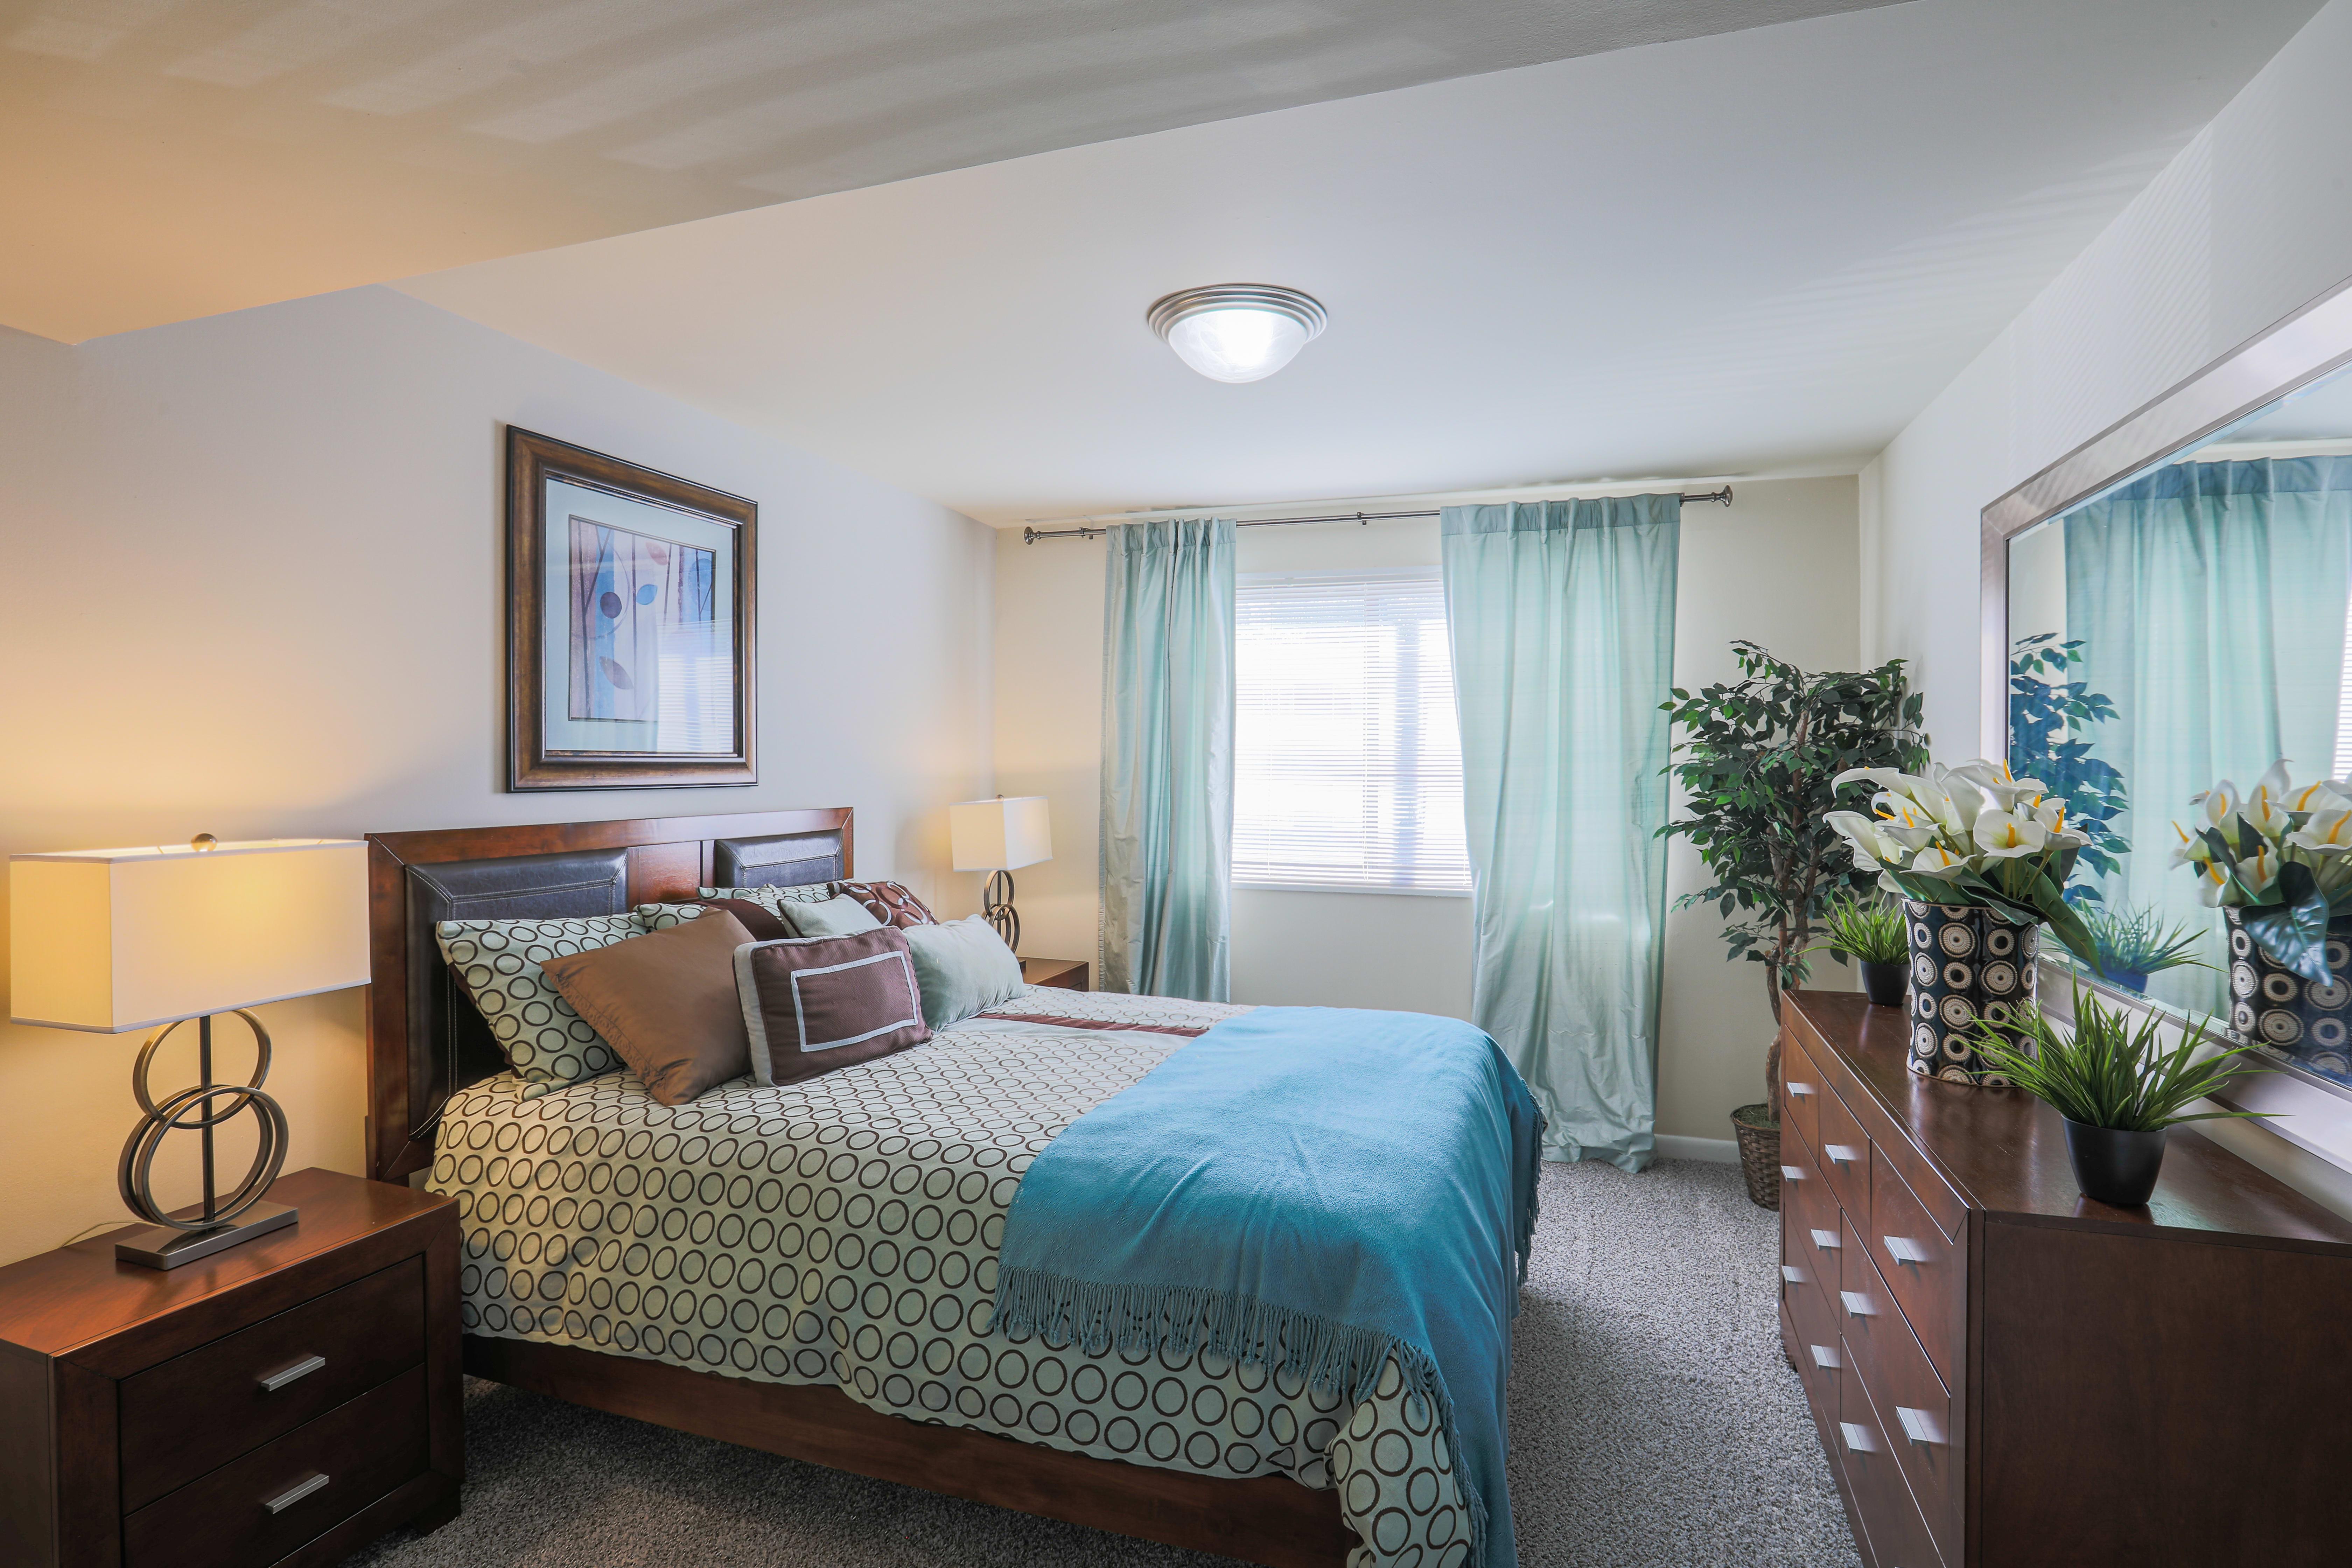 Cozy and spacious bedroom in Regency Pointe